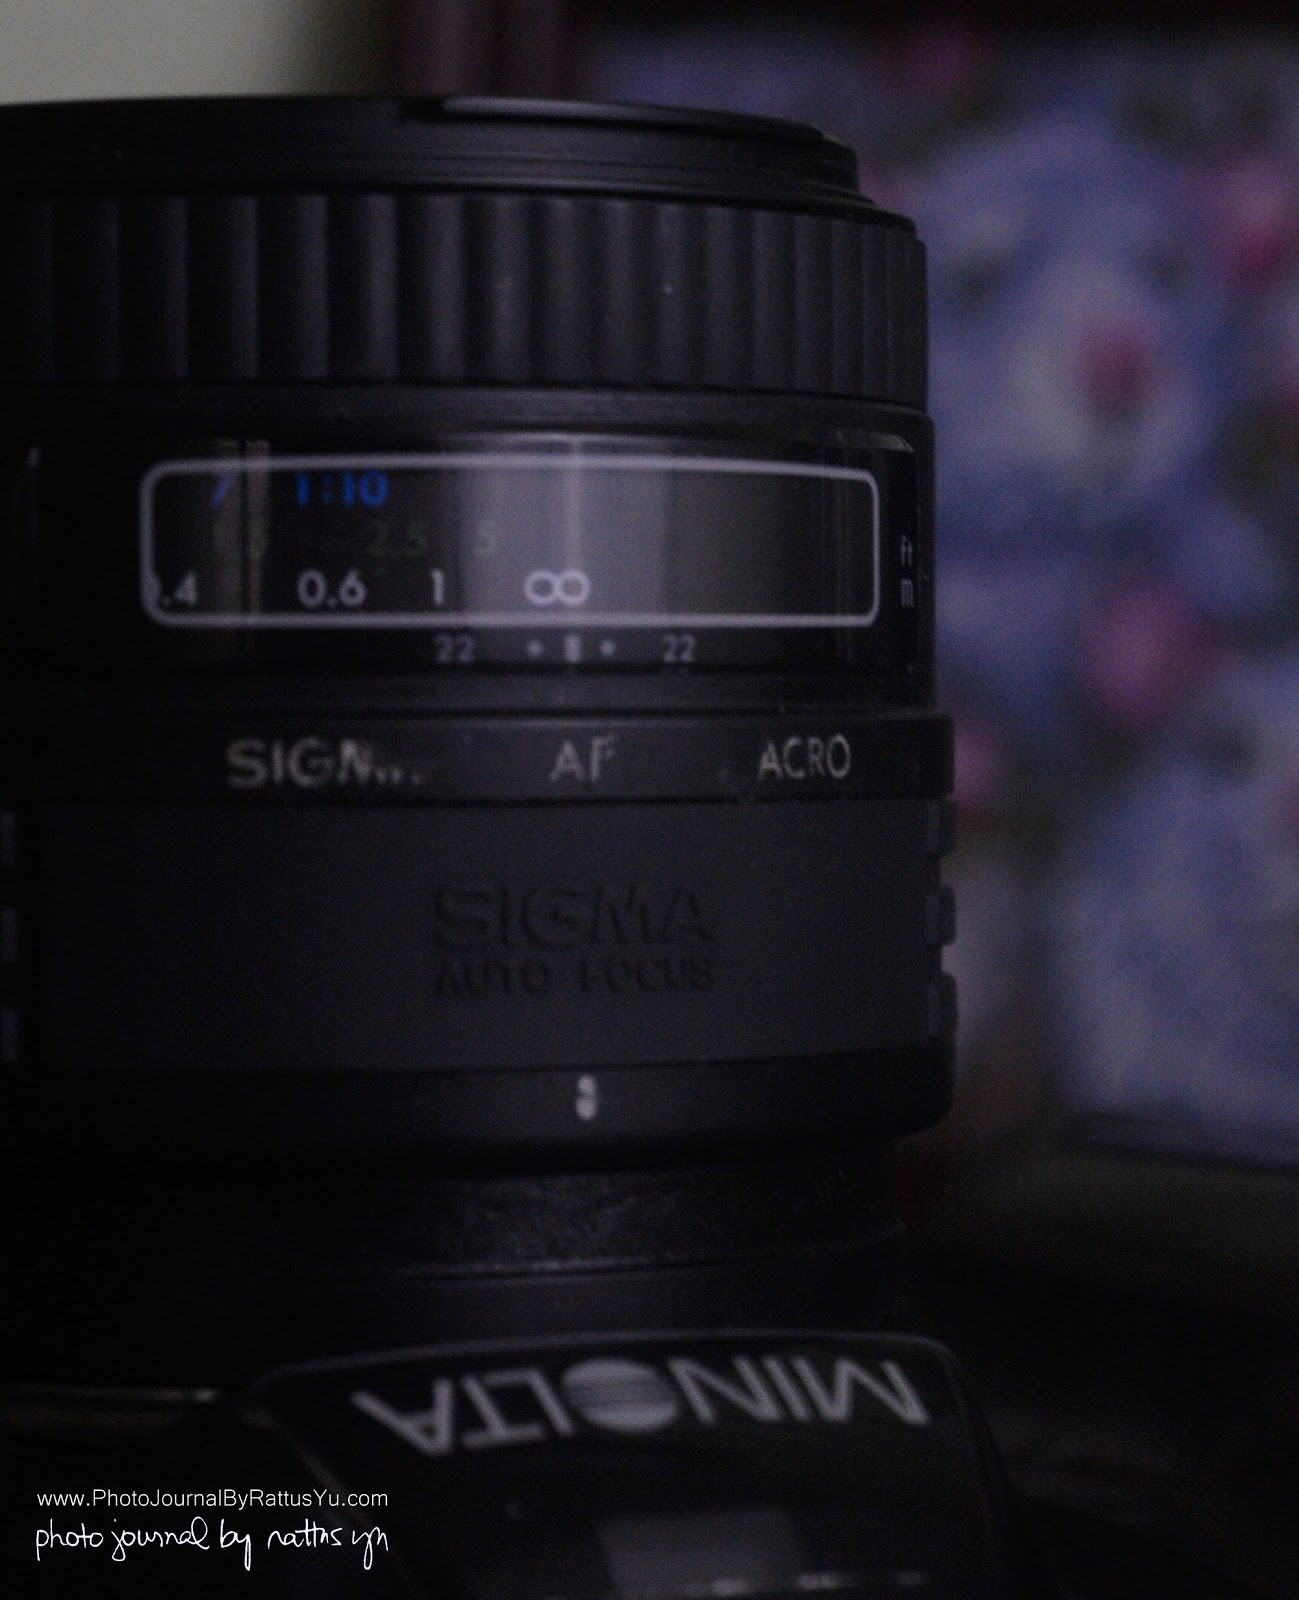 Sigma AF 50mm f/2.8 Macro in Minolta/Sony A Mount